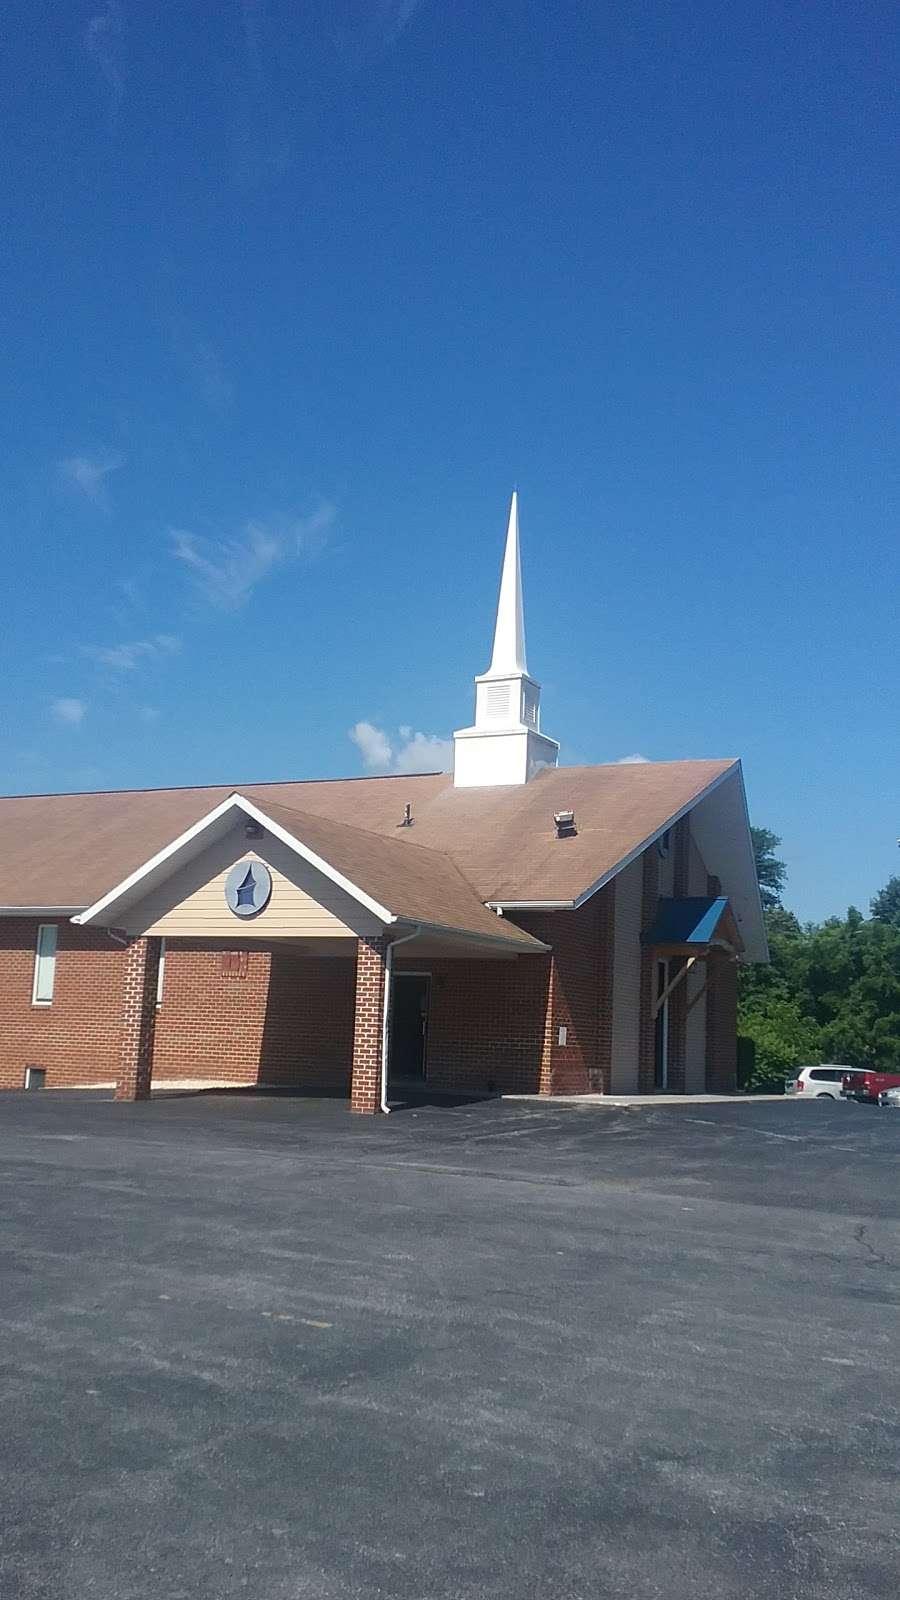 Hope Community Church - church  | Photo 1 of 9 | Address: 6867 Hedgesville Rd, Hedgesville, WV 25427, USA | Phone: (304) 754-8020